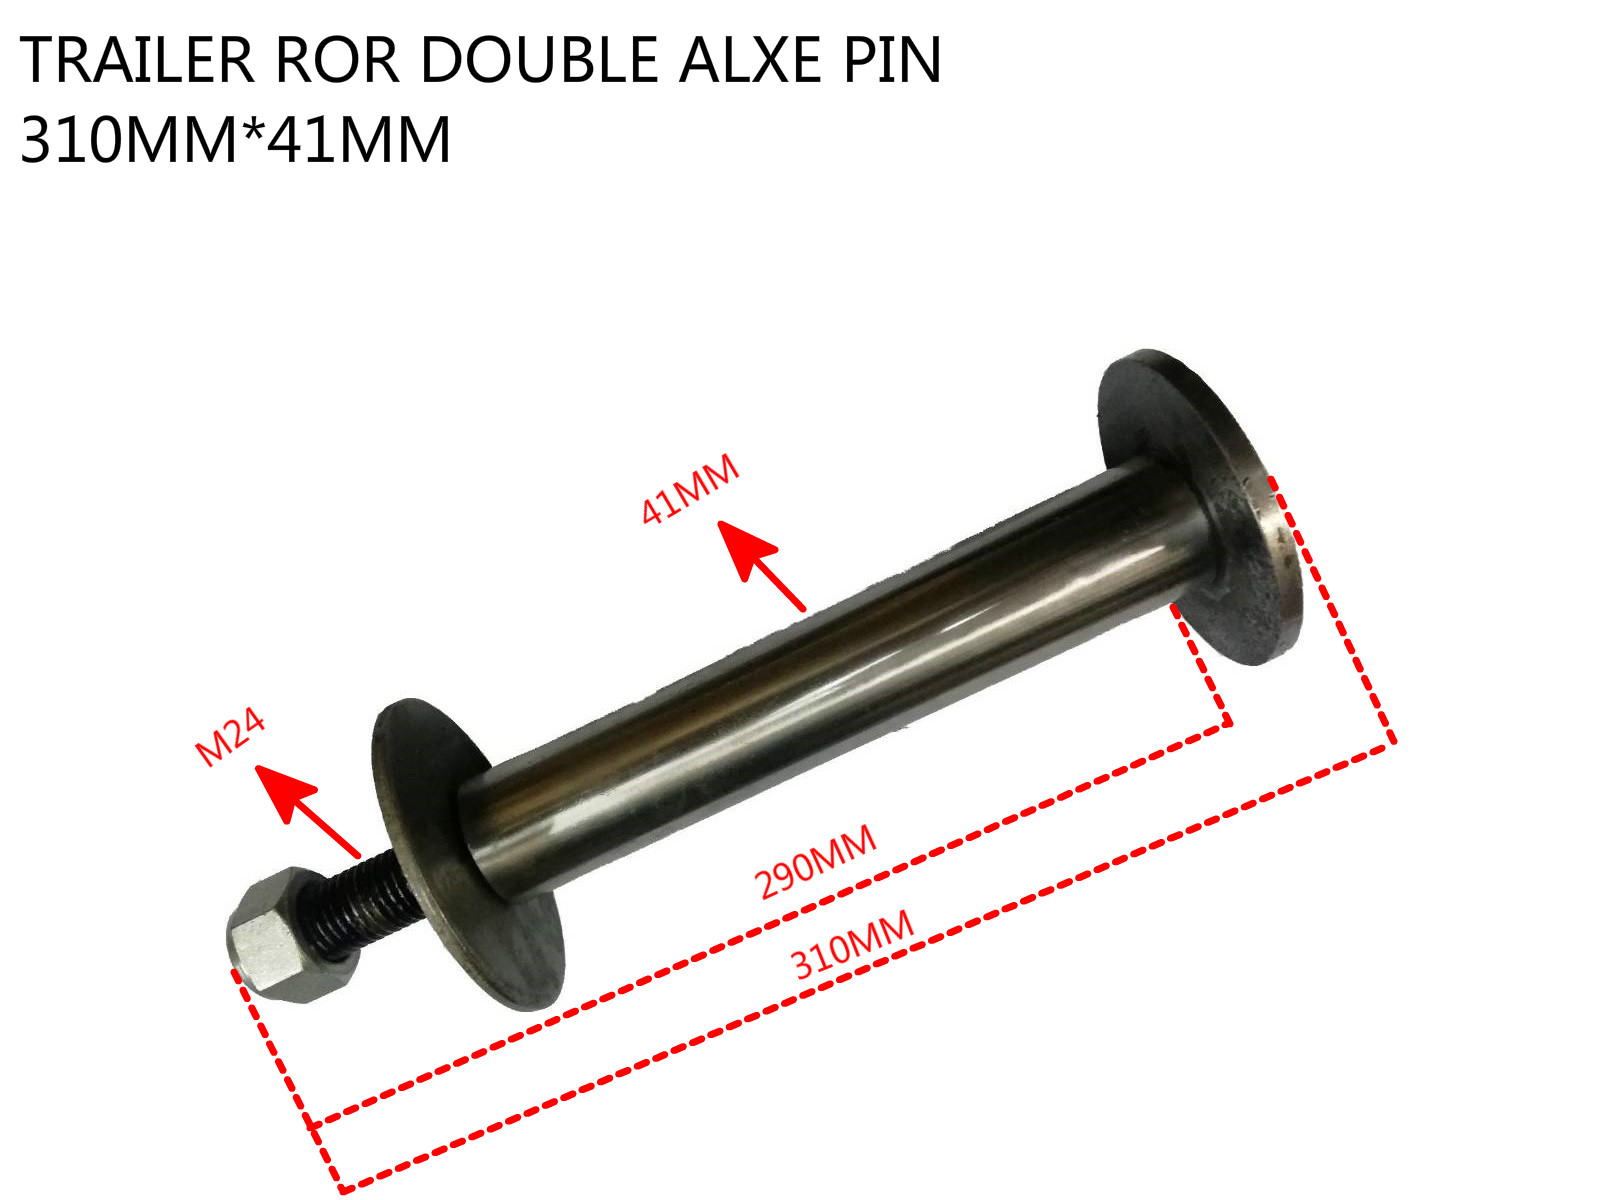 TRAILER ROR DOUBLE AXLE PIN